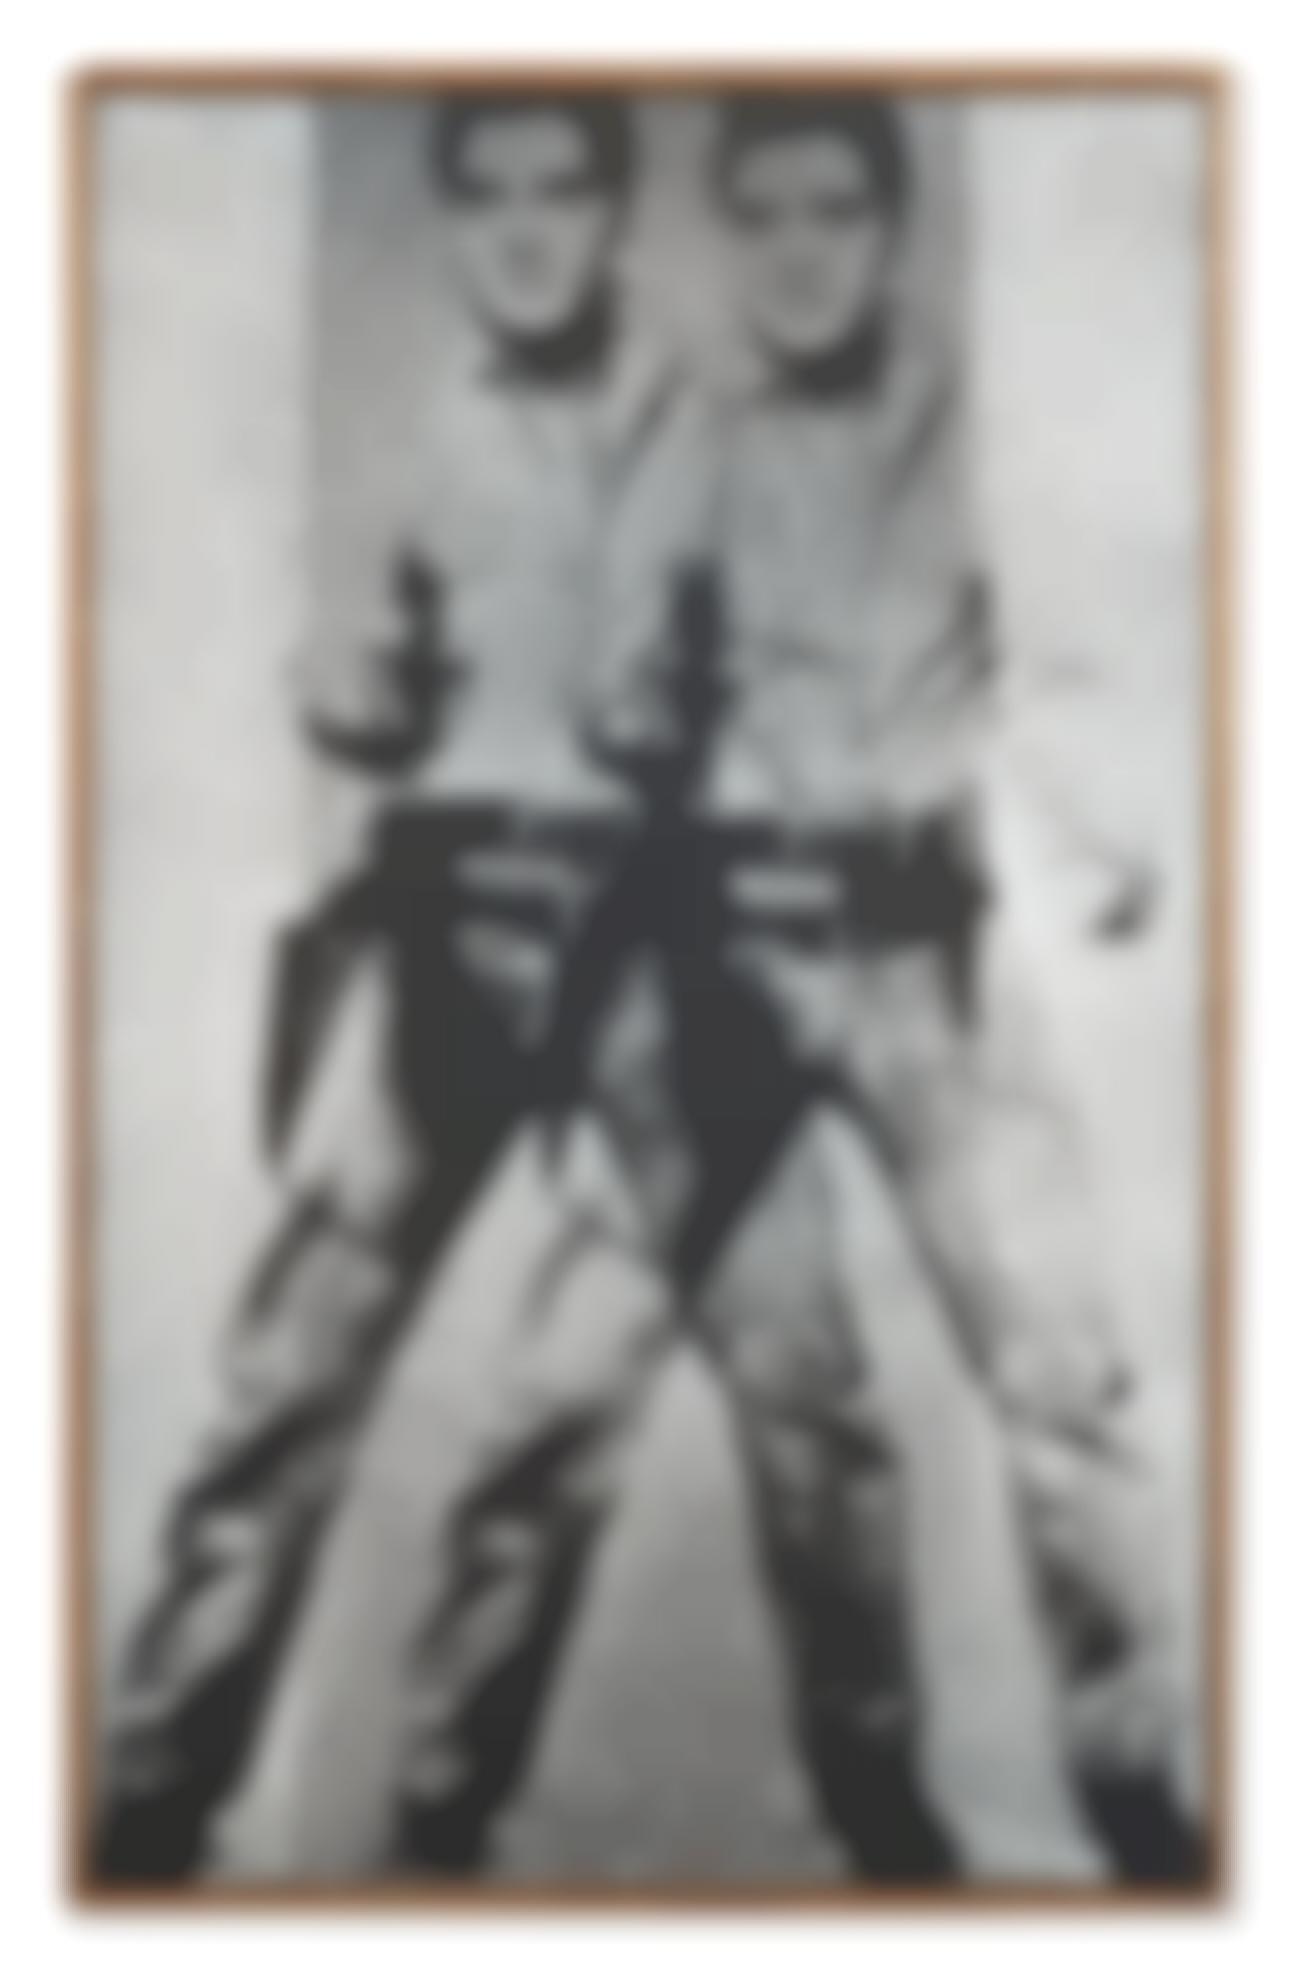 Richard Pettibone-Andy Warhol, 'Elvis', 1964-1964